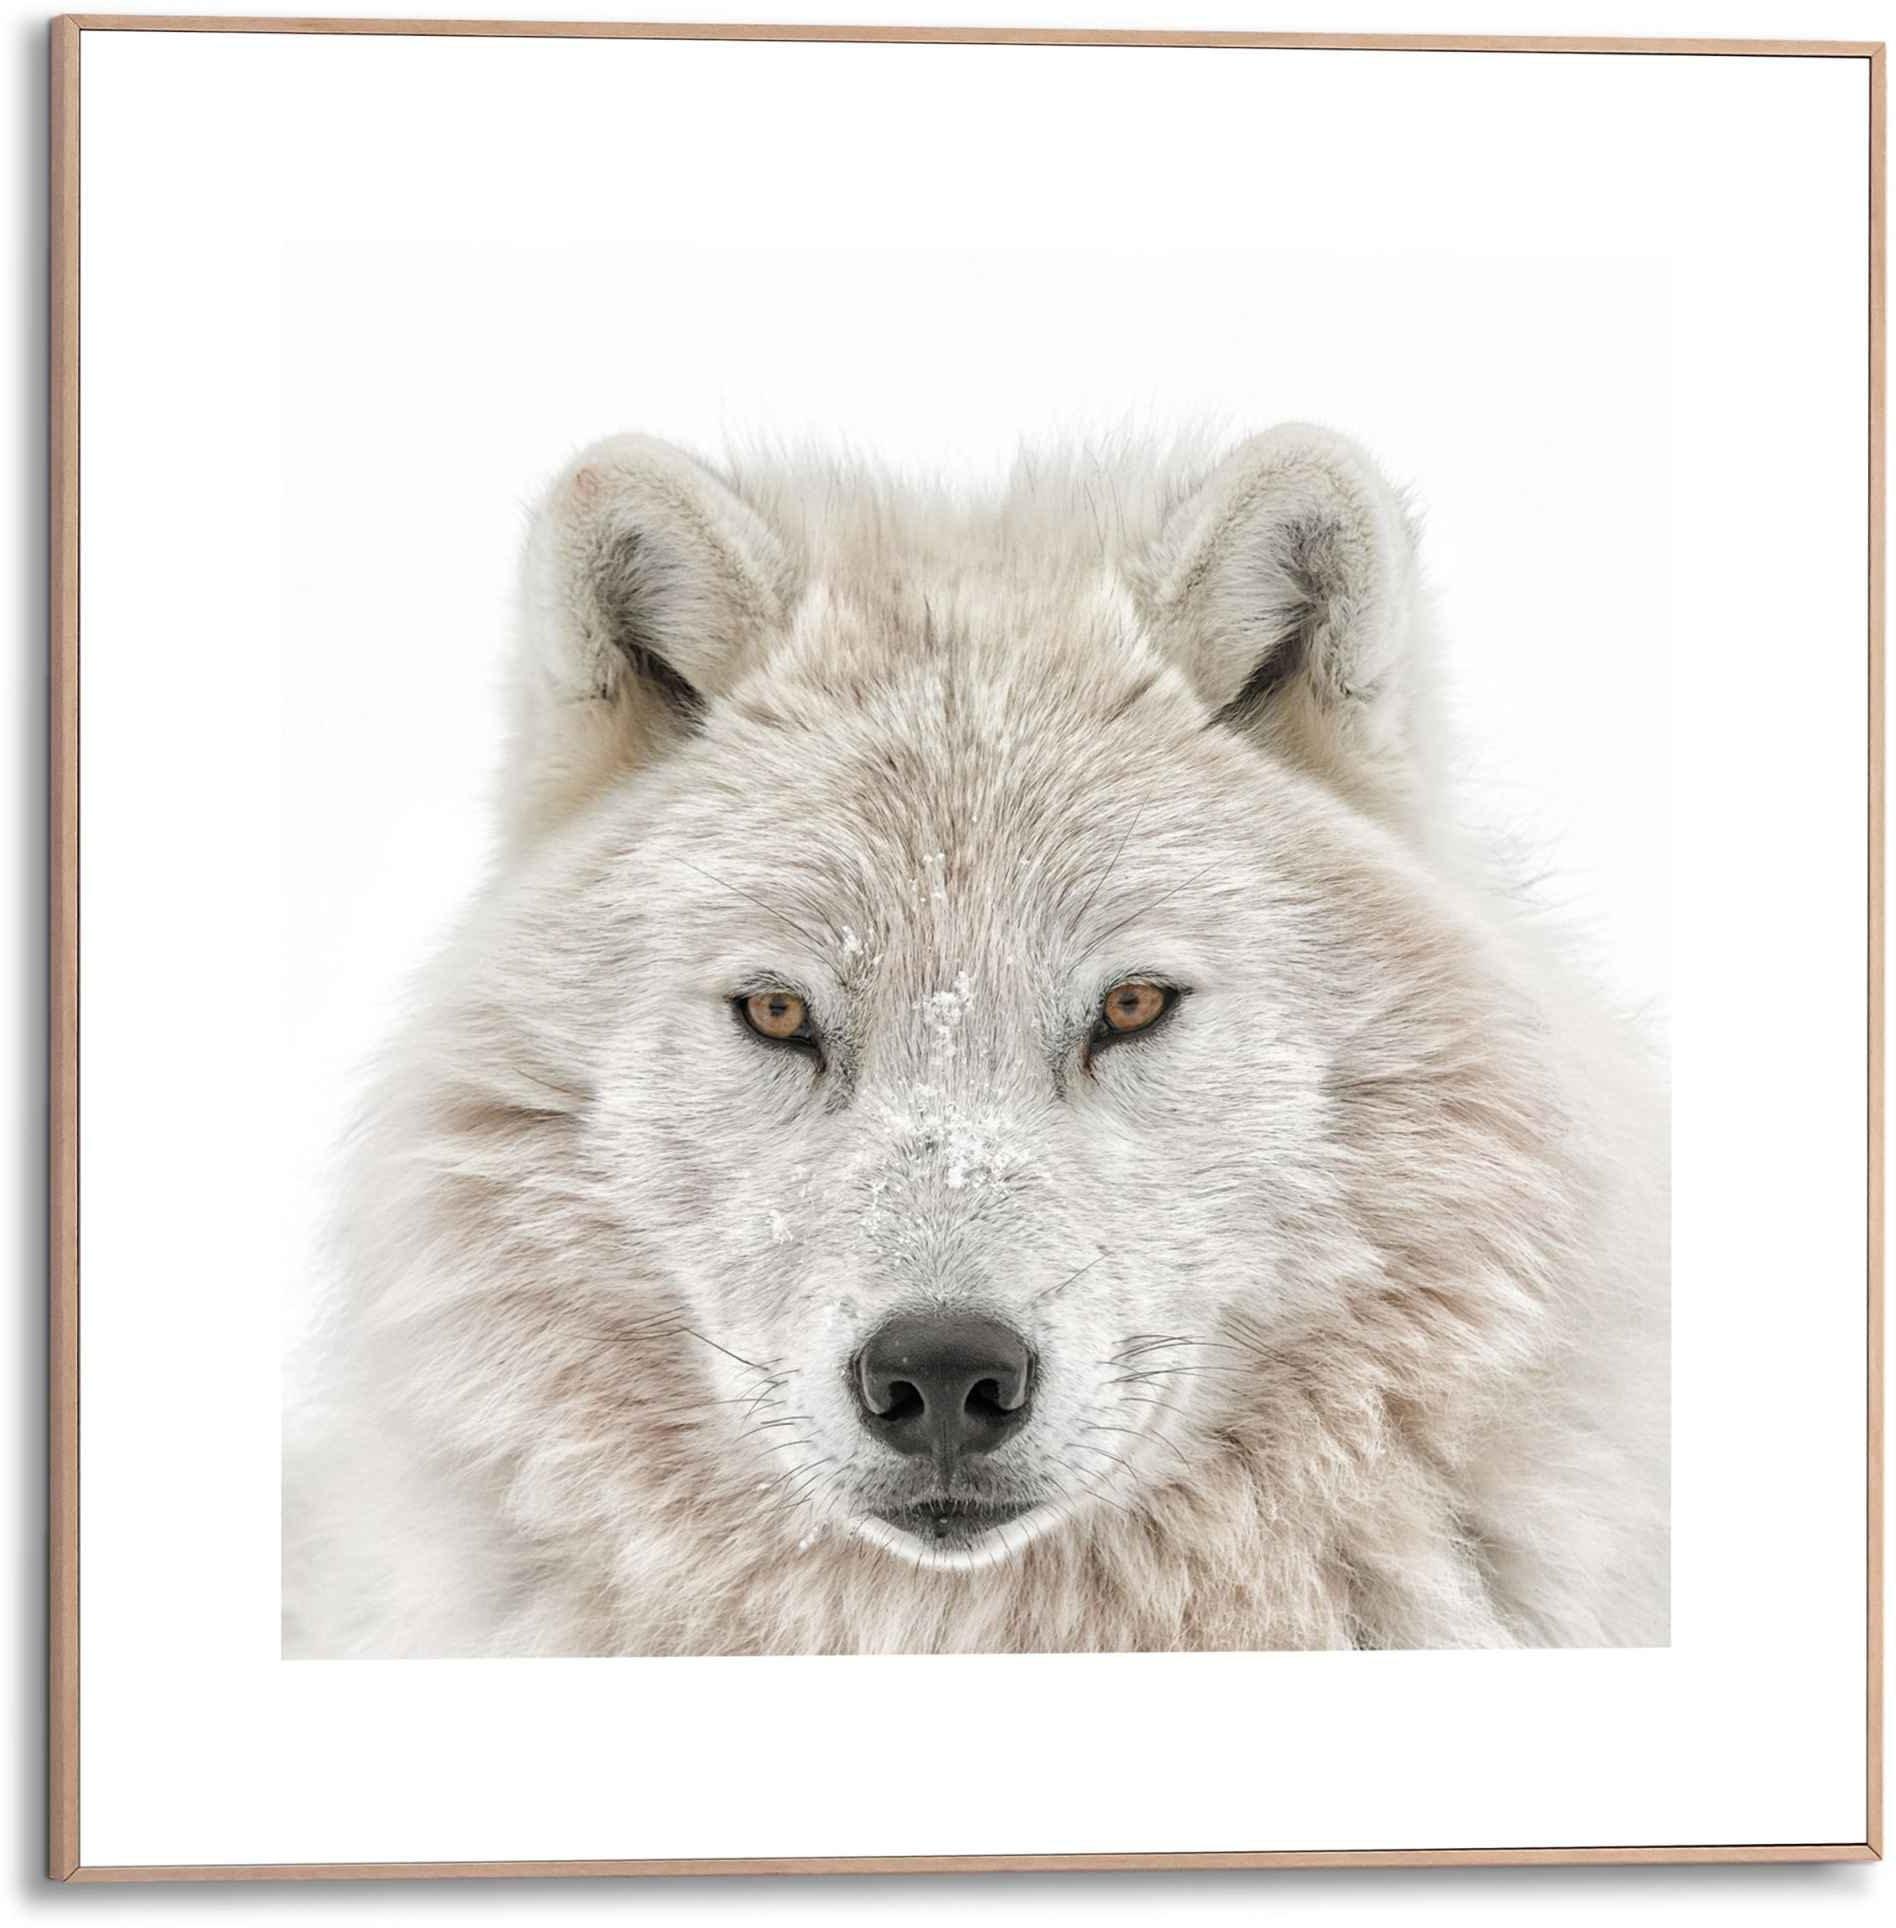 Reinders! artprint Gerahmtes Bild Wolf (1 stuk) - verschillende betaalmethodes